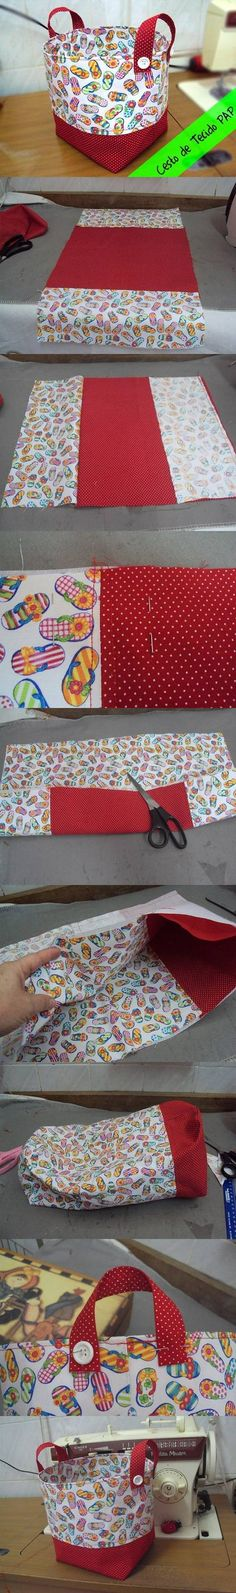 DIY Easy Fabric Basket DIY Projects / UsefulDIY.com